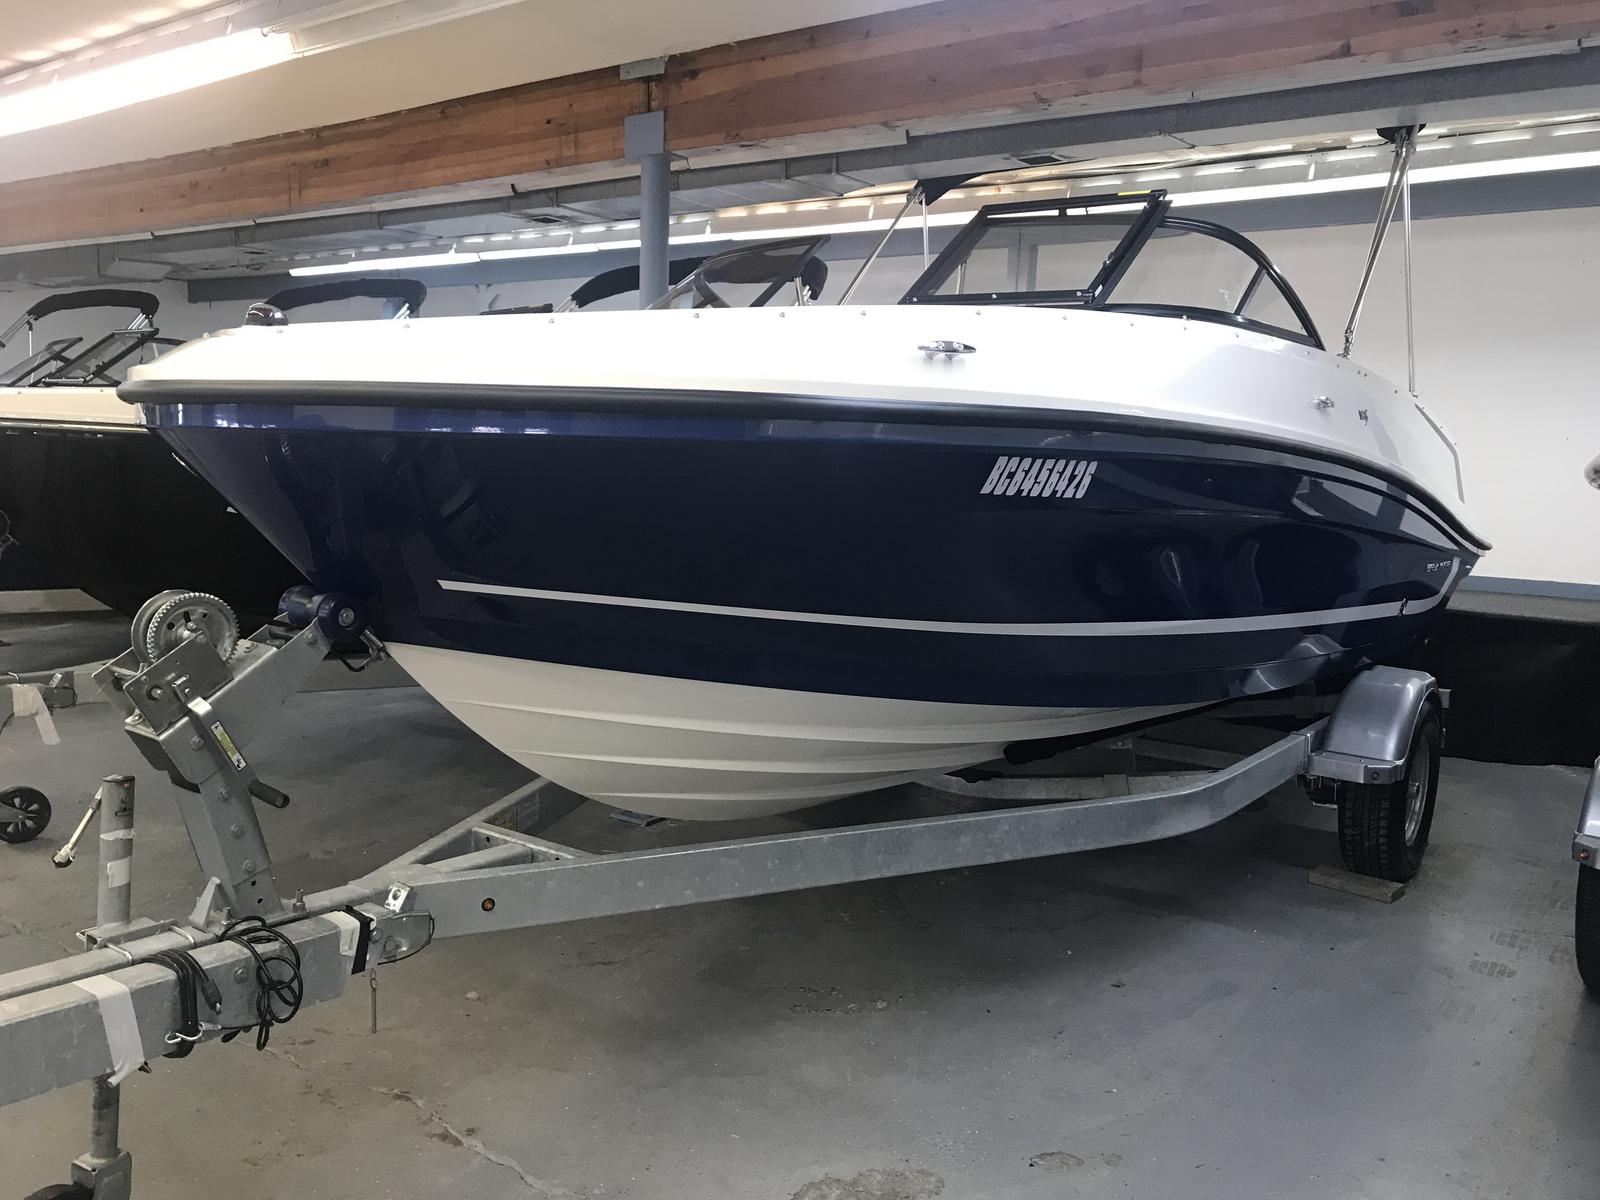 2019 Bayliner boat for sale, model of the boat is VR5 Bowrider & Image # 1 of 20